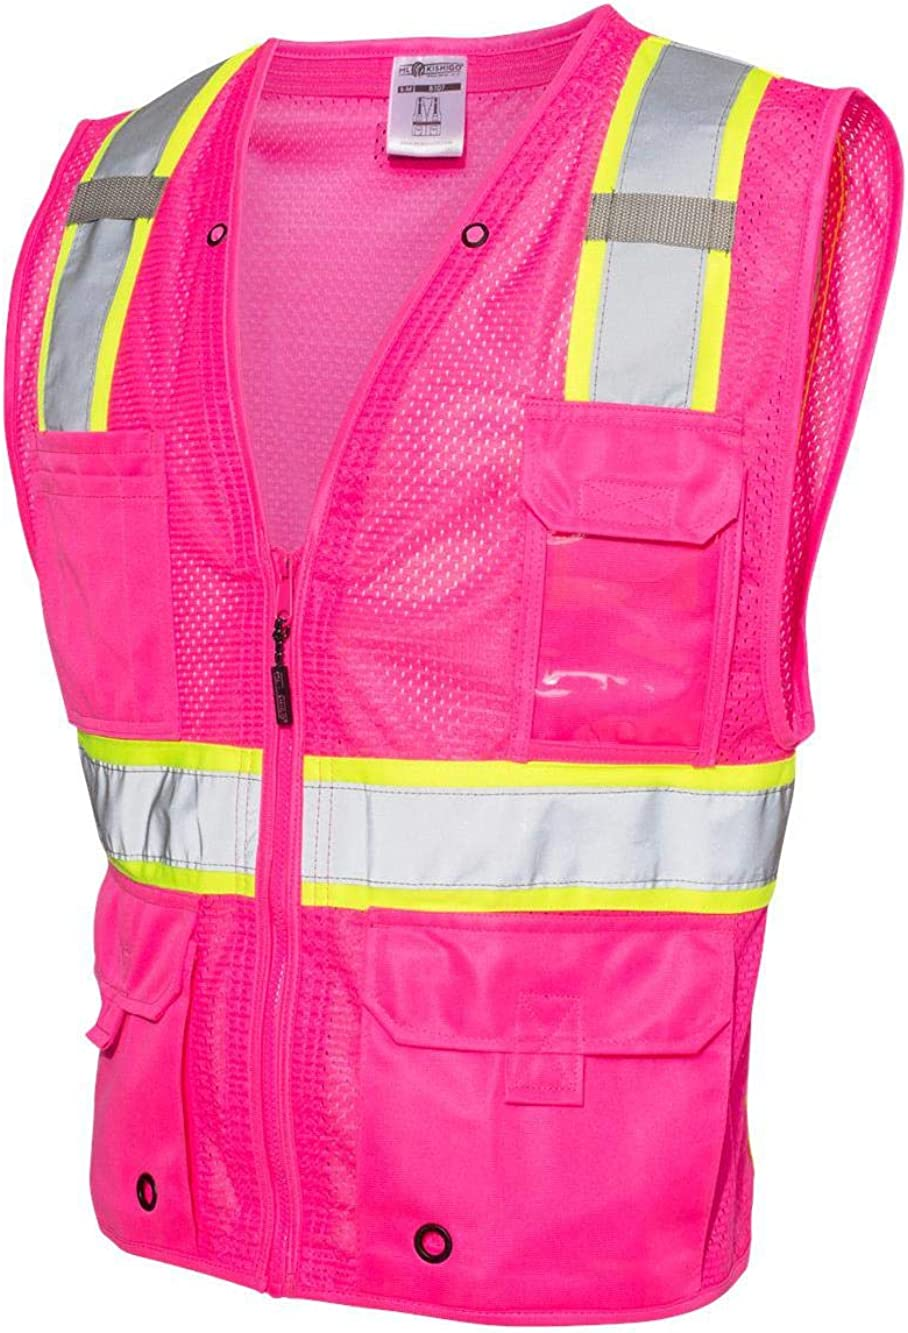 New mail order ML Kishigo Miami Mall - Mesh Enhanced Visibility Multi-Pocket Vest B100-1